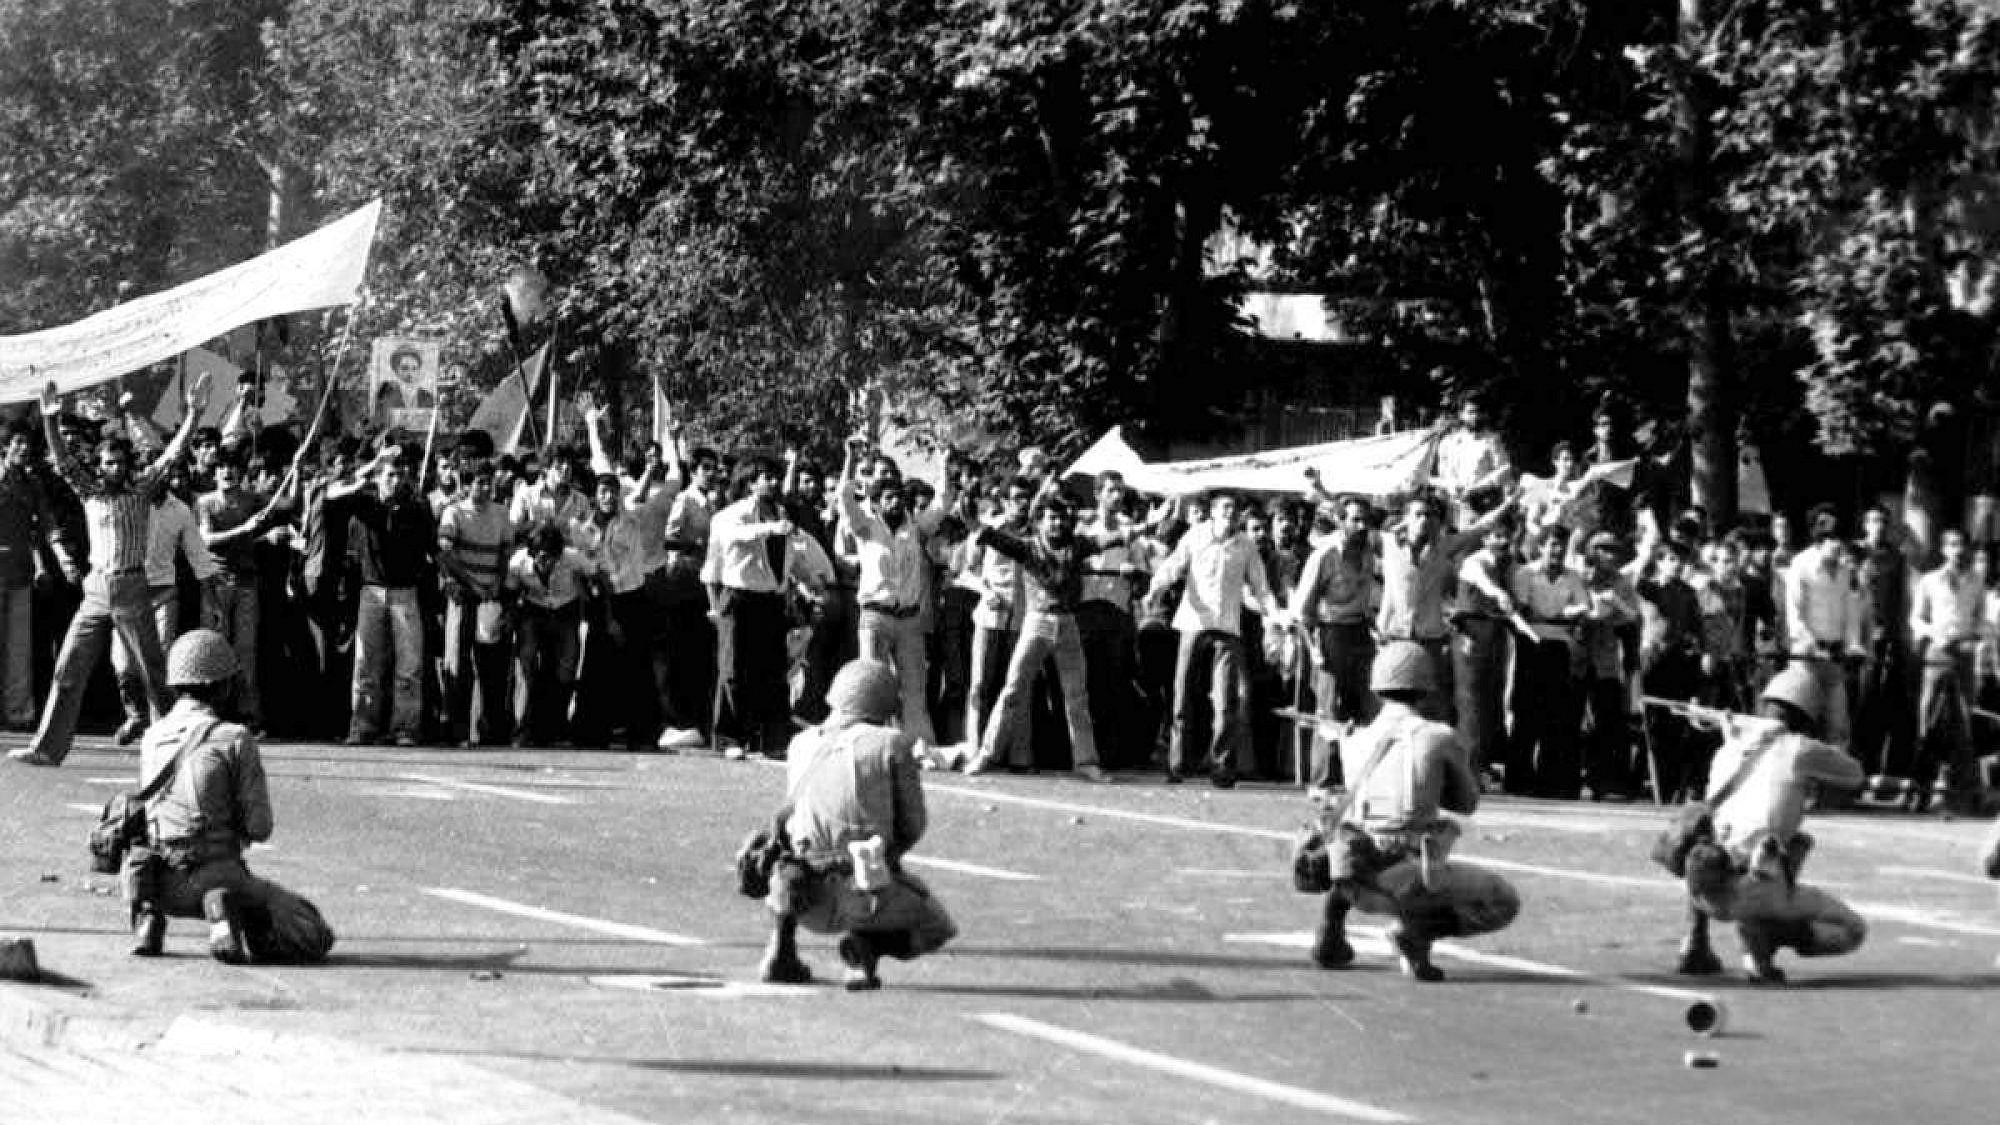 Scene from Iranian Revolution of 1979. Credit: Wikimedia Commons